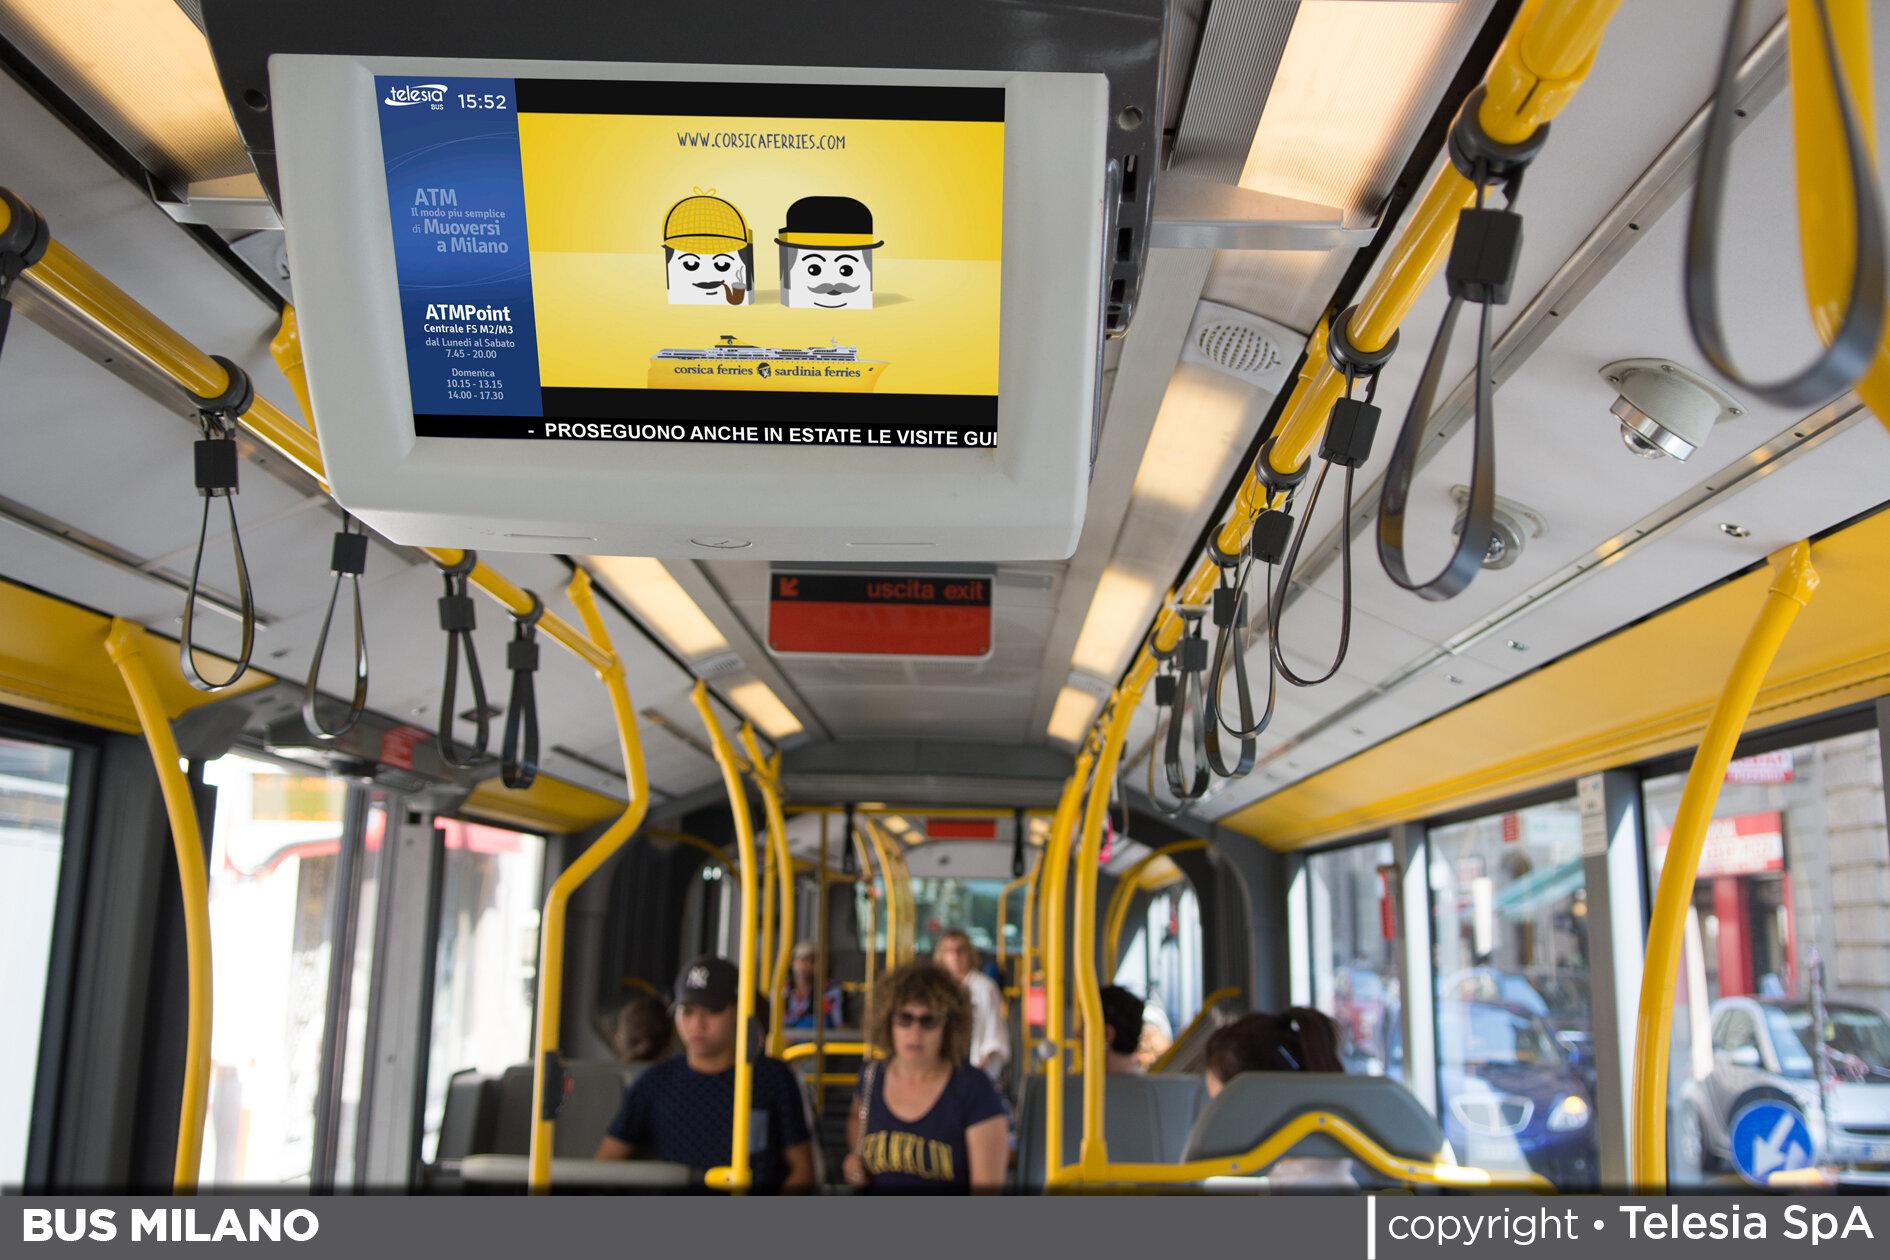 T_bus2.jpg